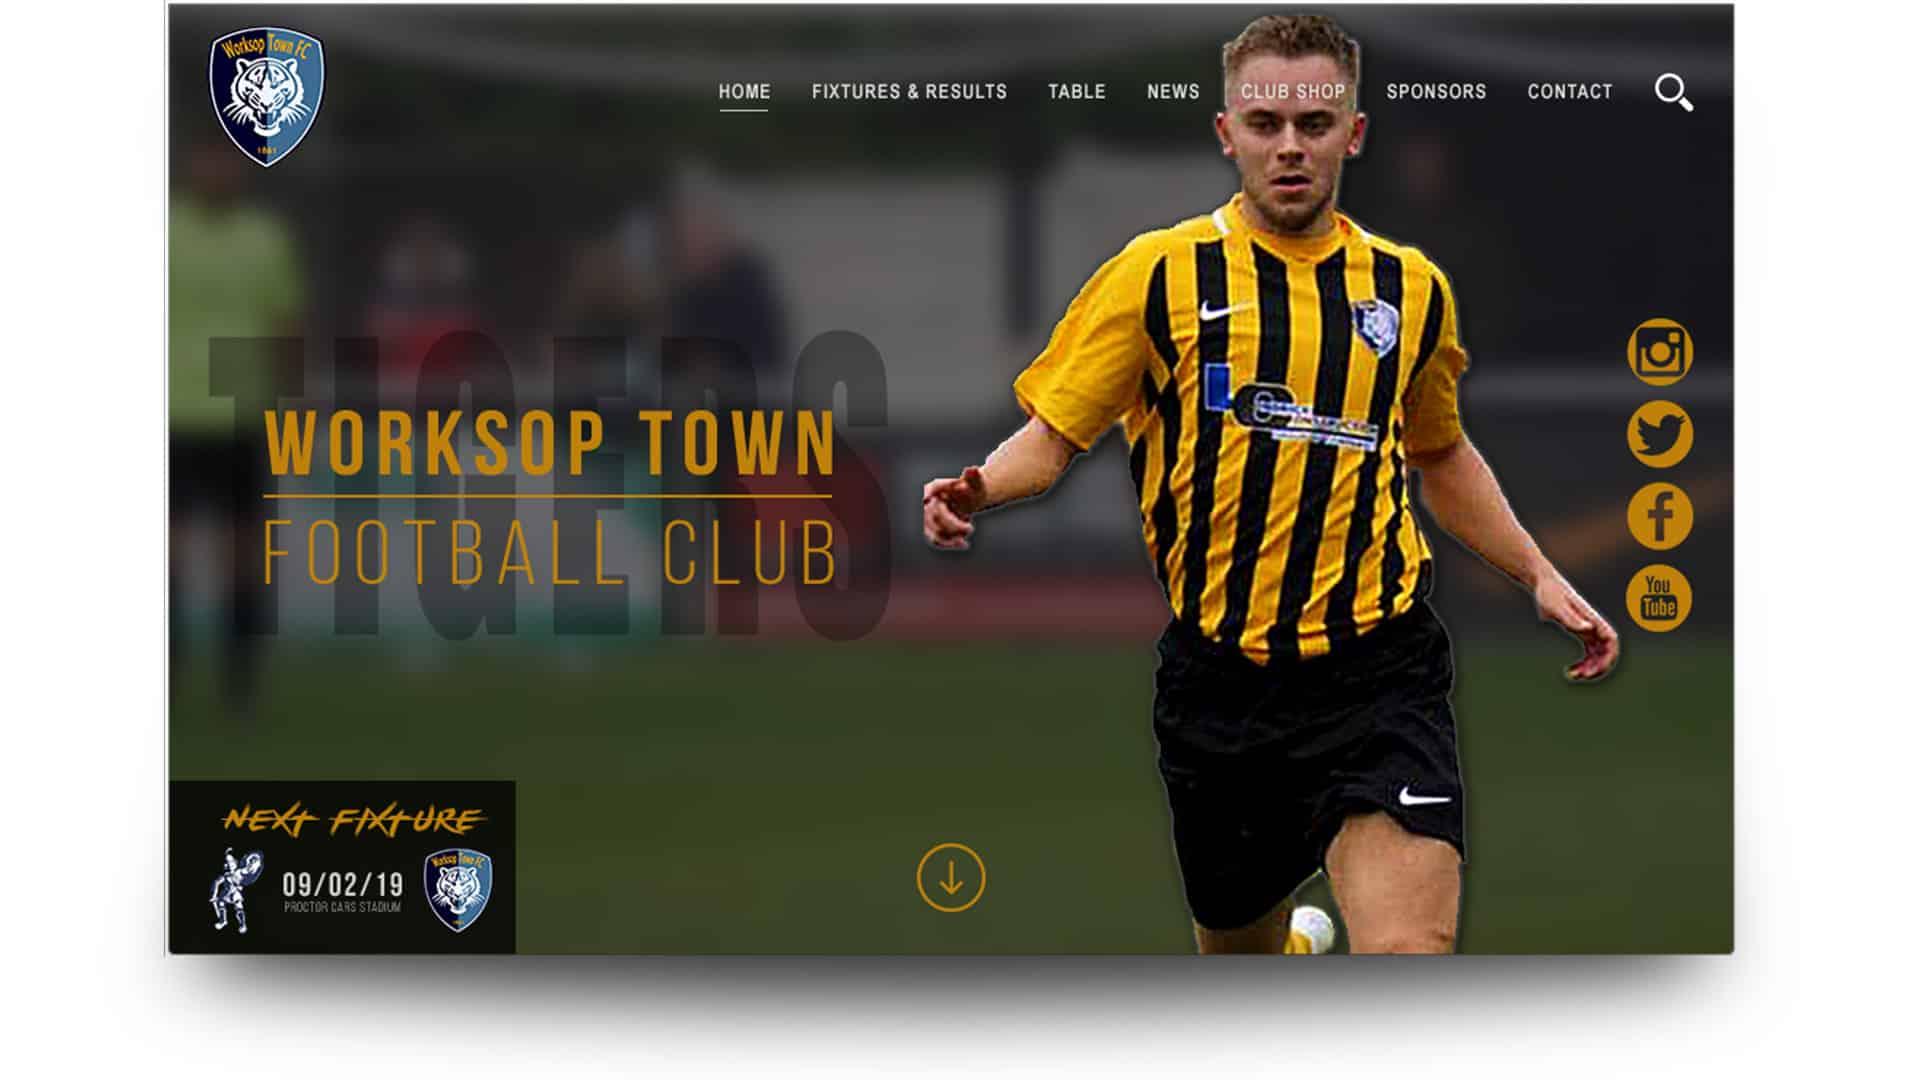 worksop town fc - wordpress website design